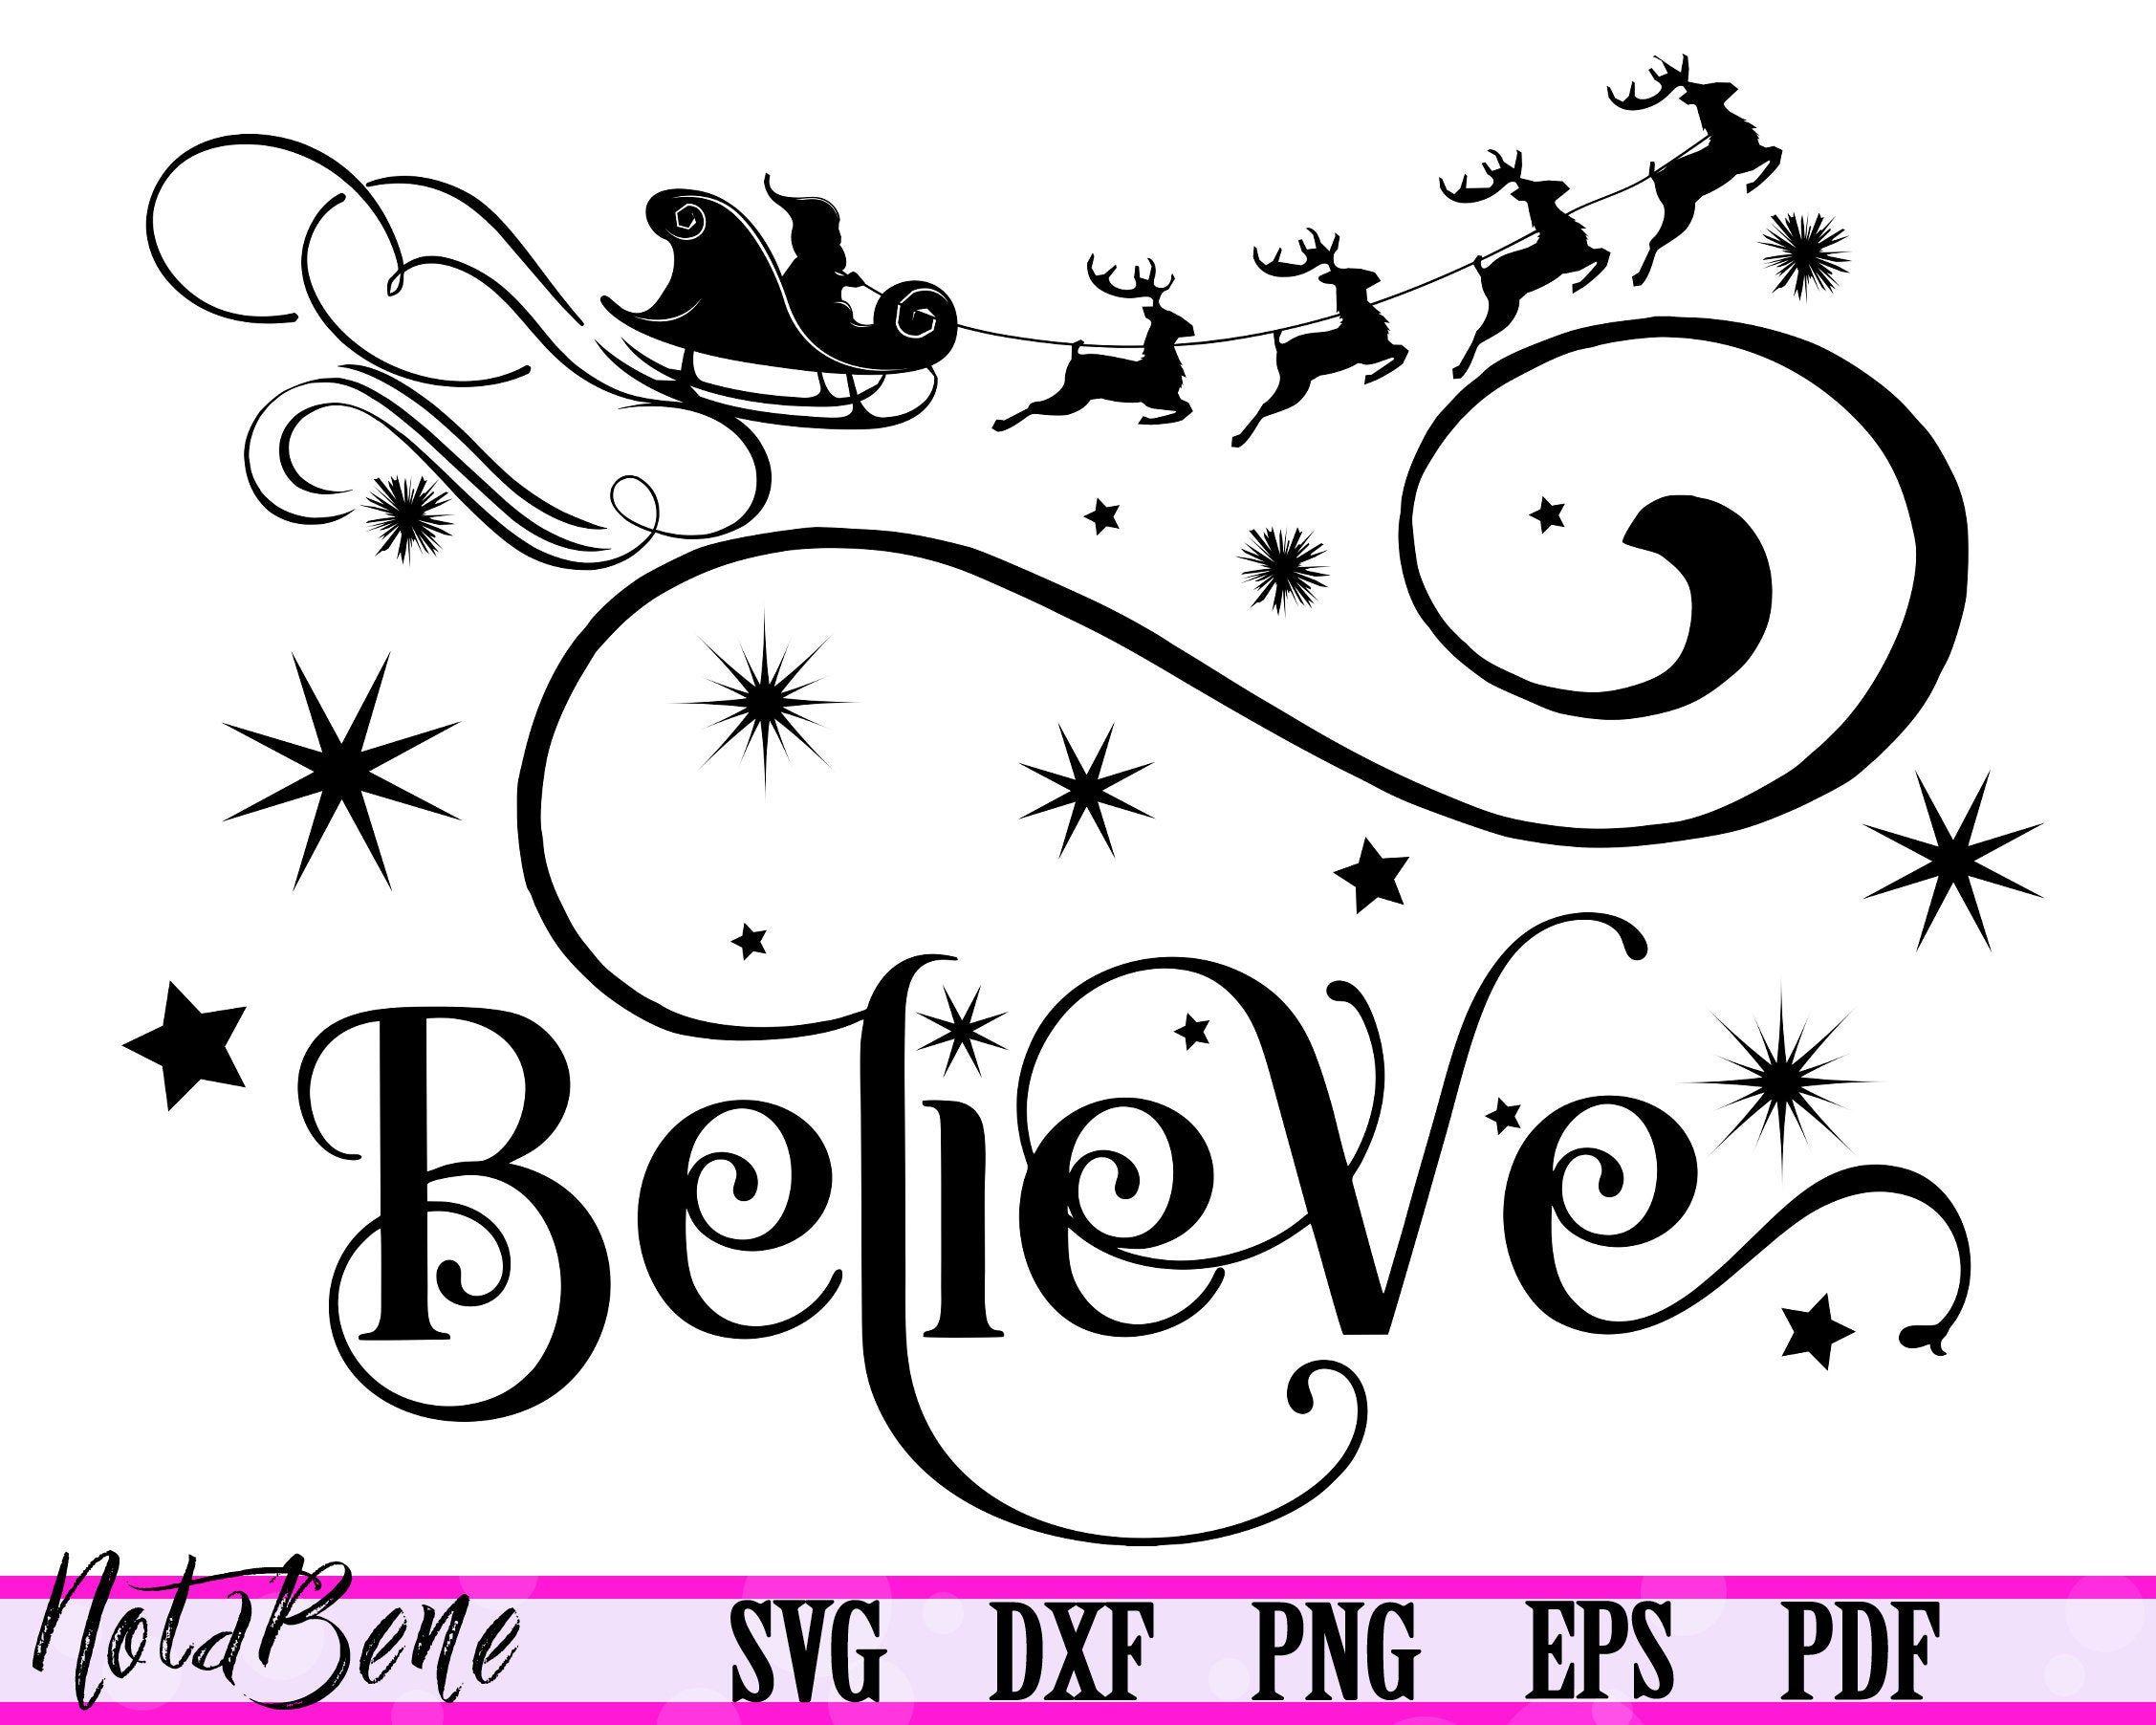 Believe Svg Christmas Sleigh Svg Holiday Svg Winter Svg